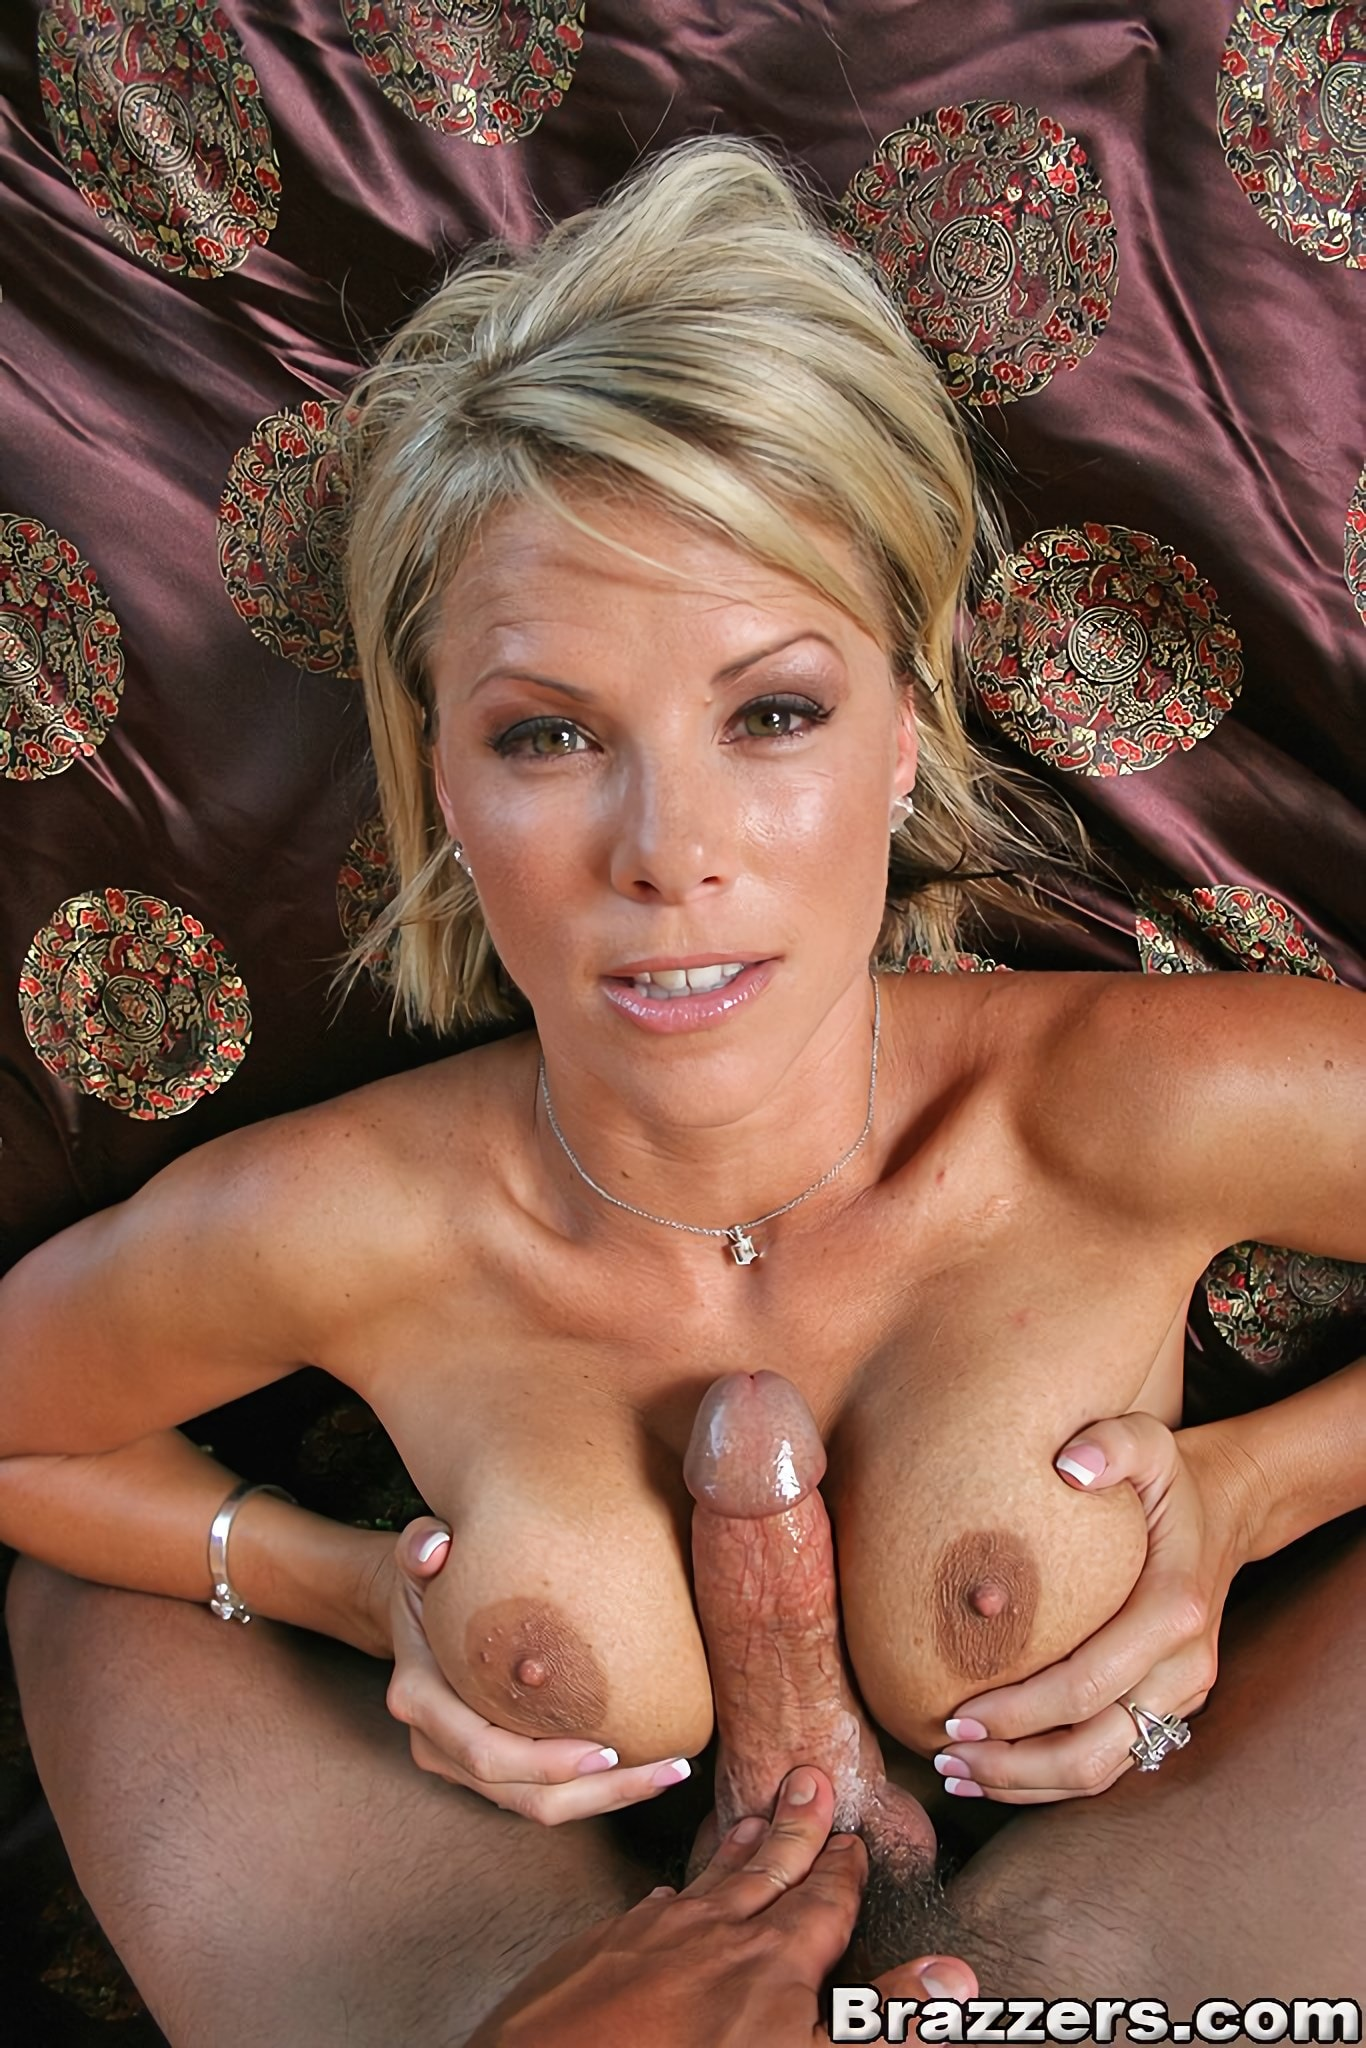 Big tit interracial anal creampie porn photo